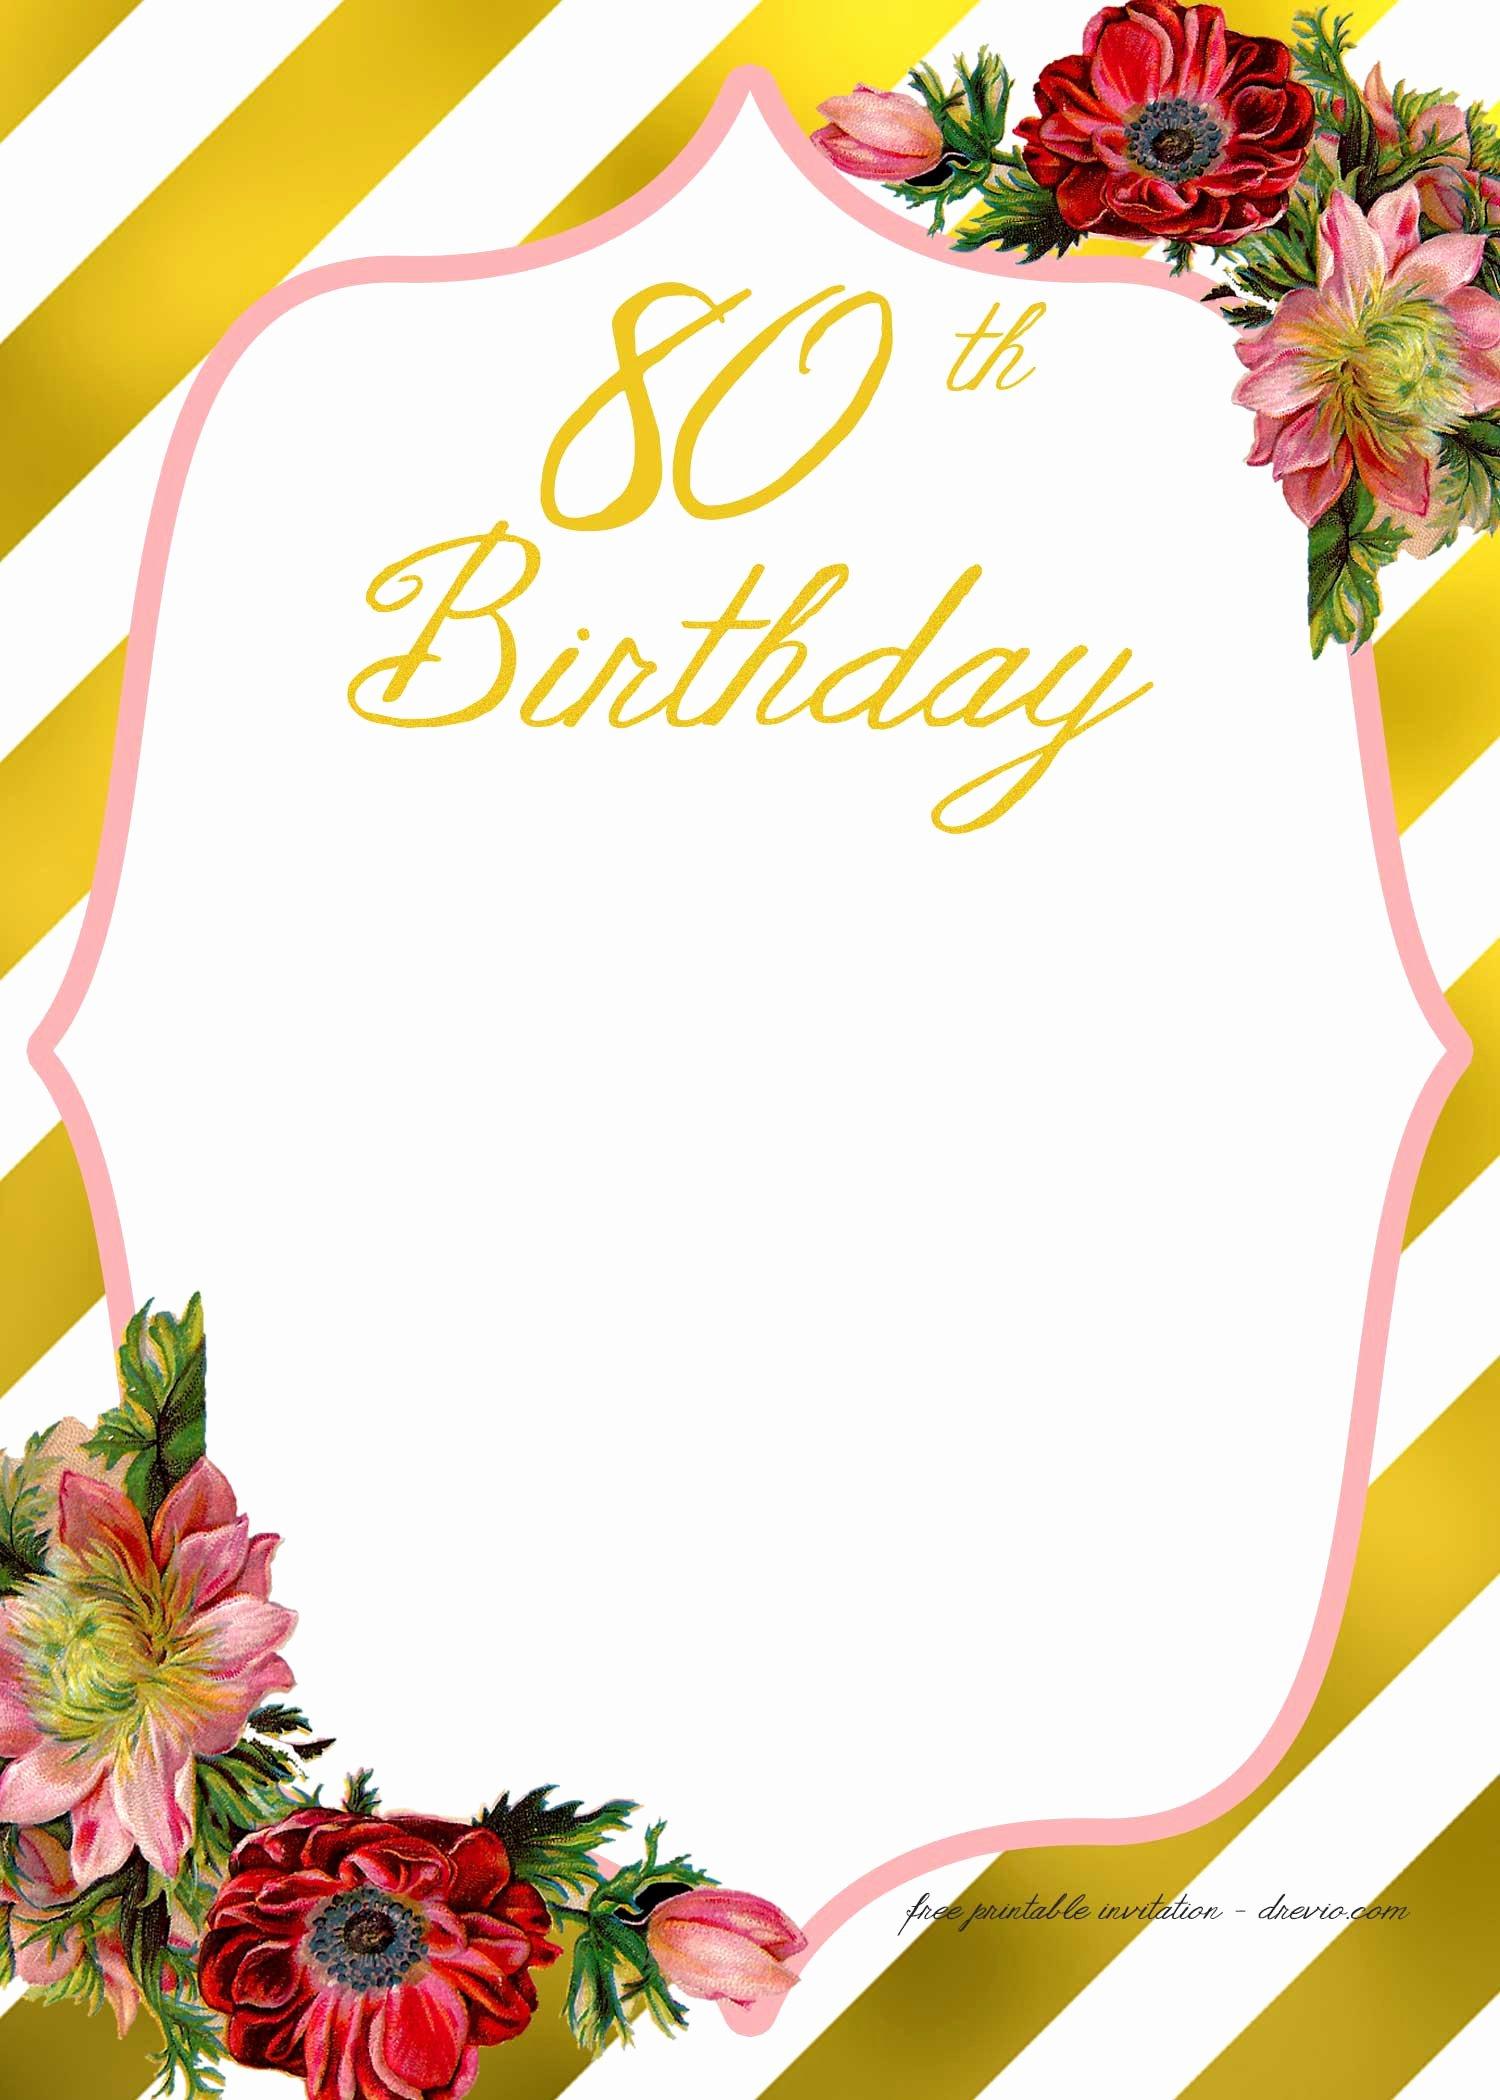 Free Printable Birthday Invitation Templates Unique Free Printable Adult Birthday Invitation Template – Free